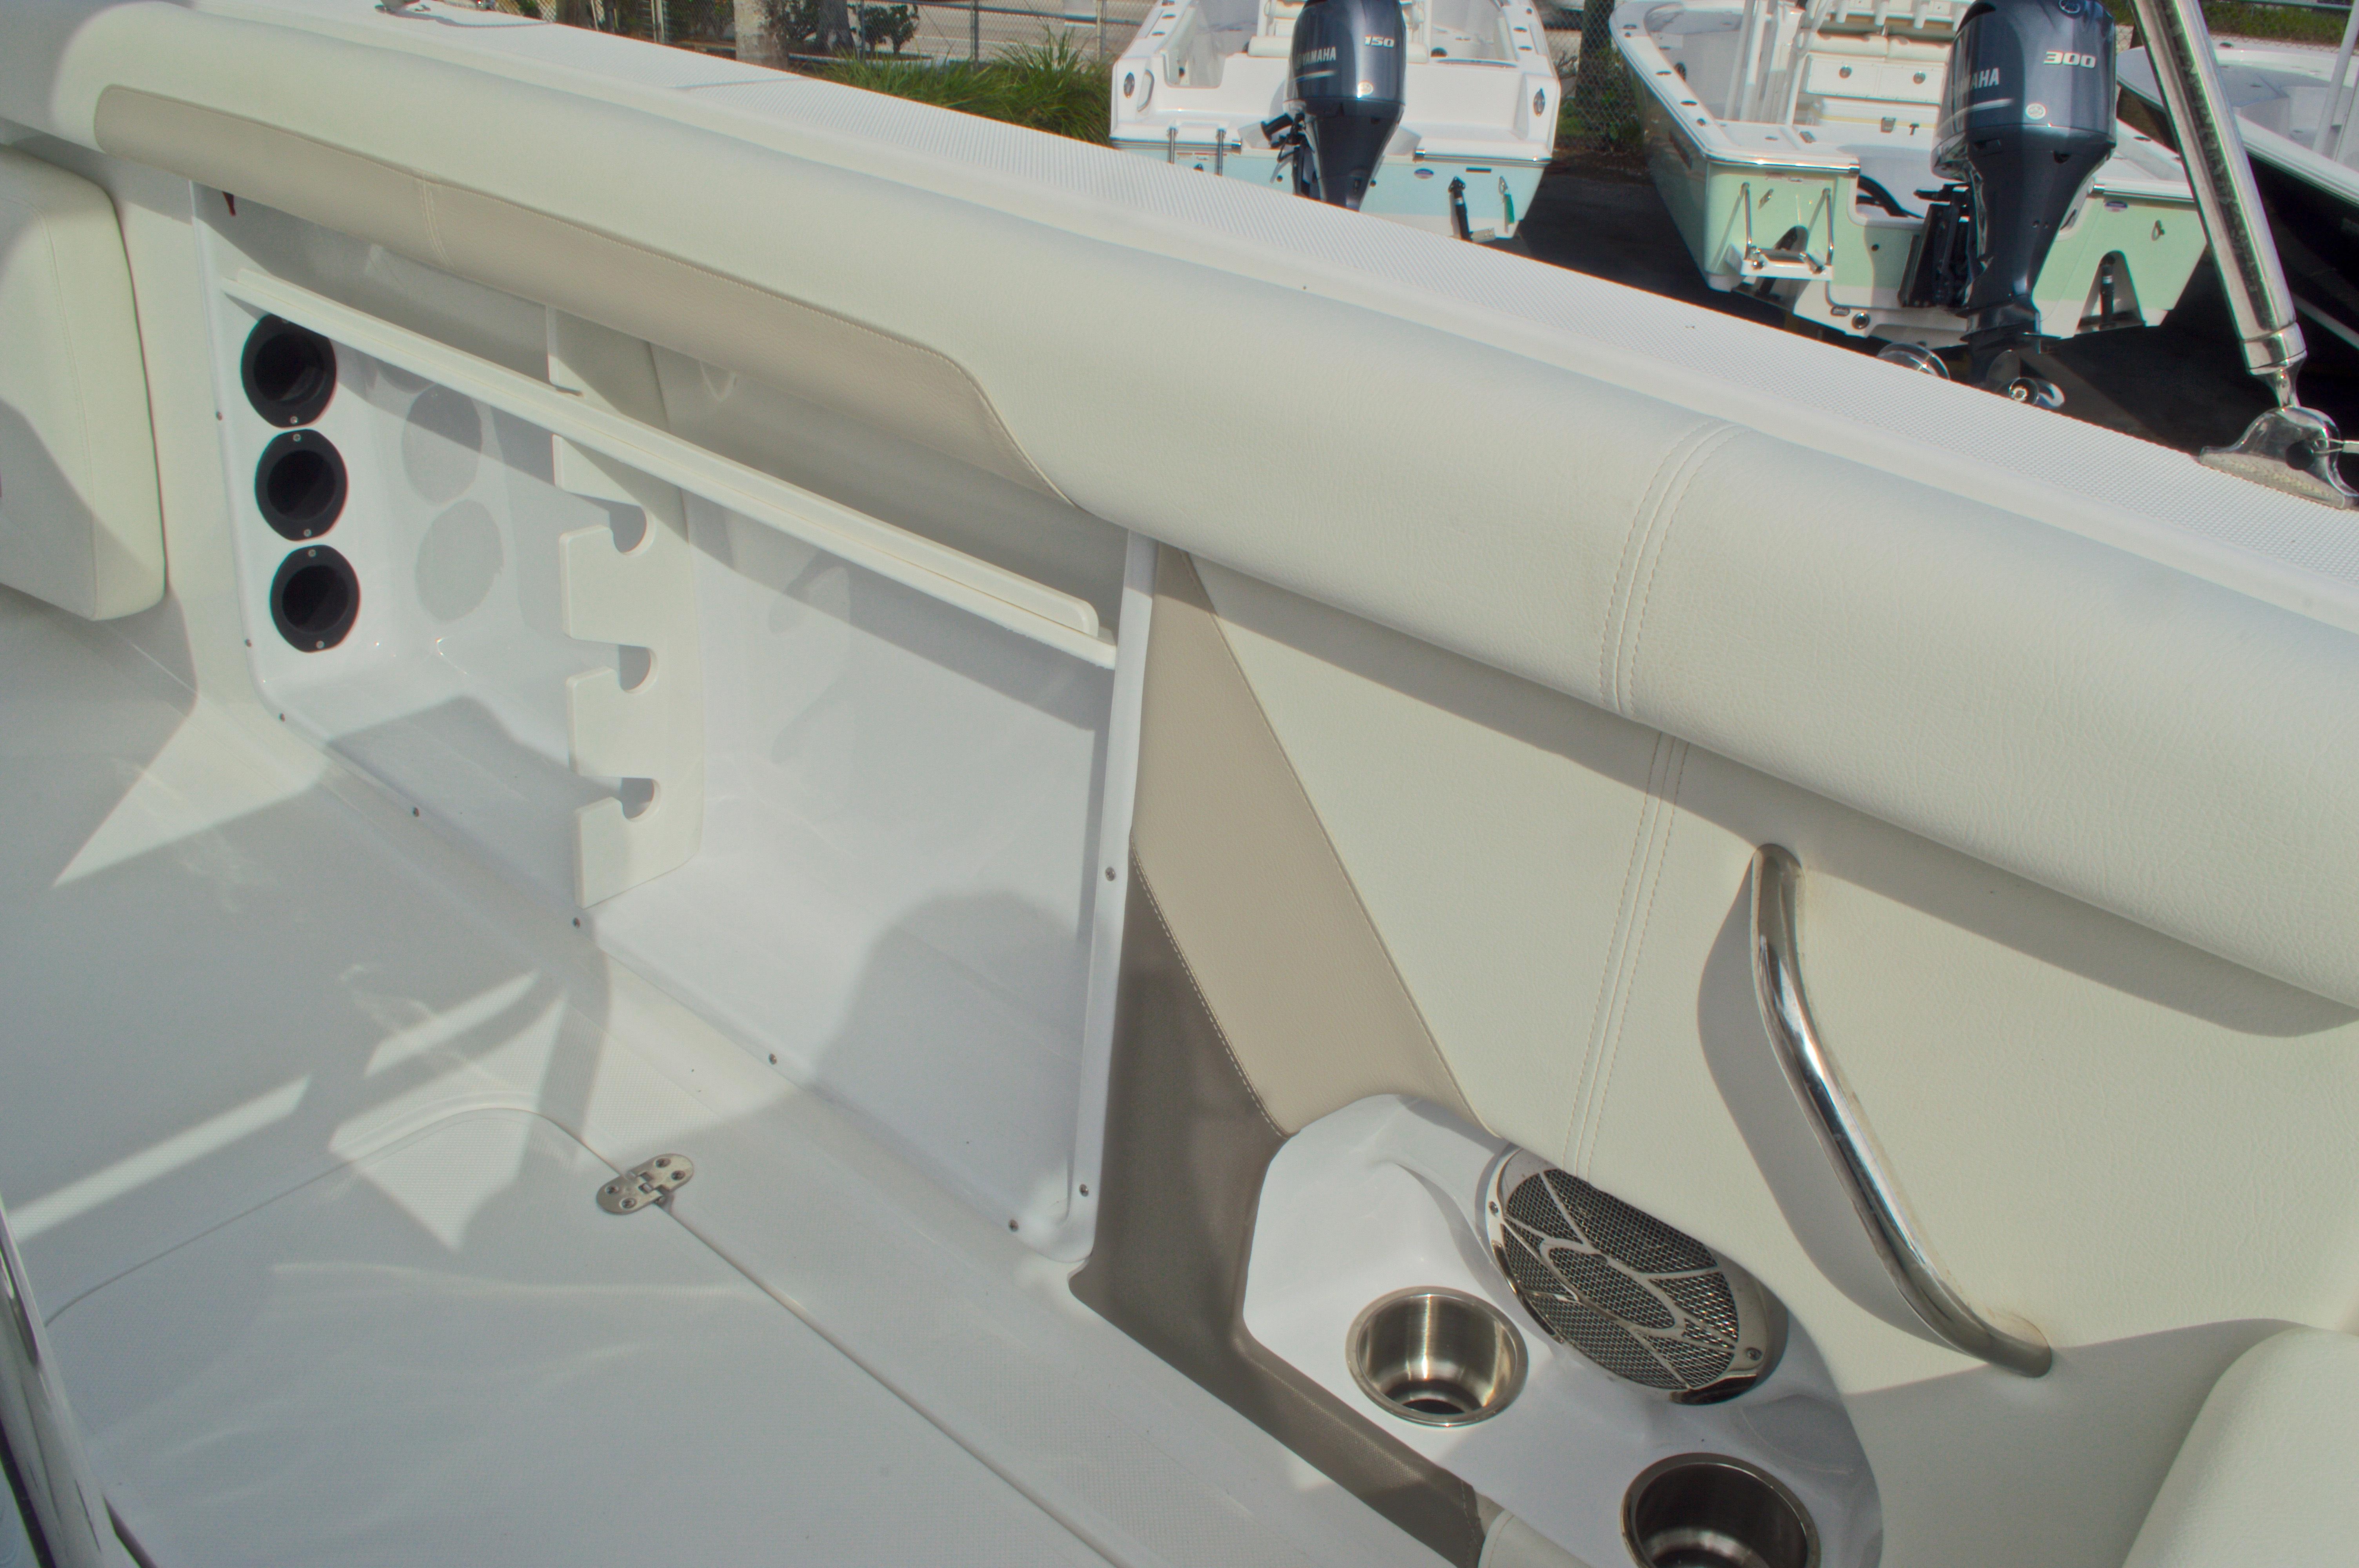 Thumbnail 26 for New 2016 Hurricane CC21 Center Console boat for sale in Vero Beach, FL